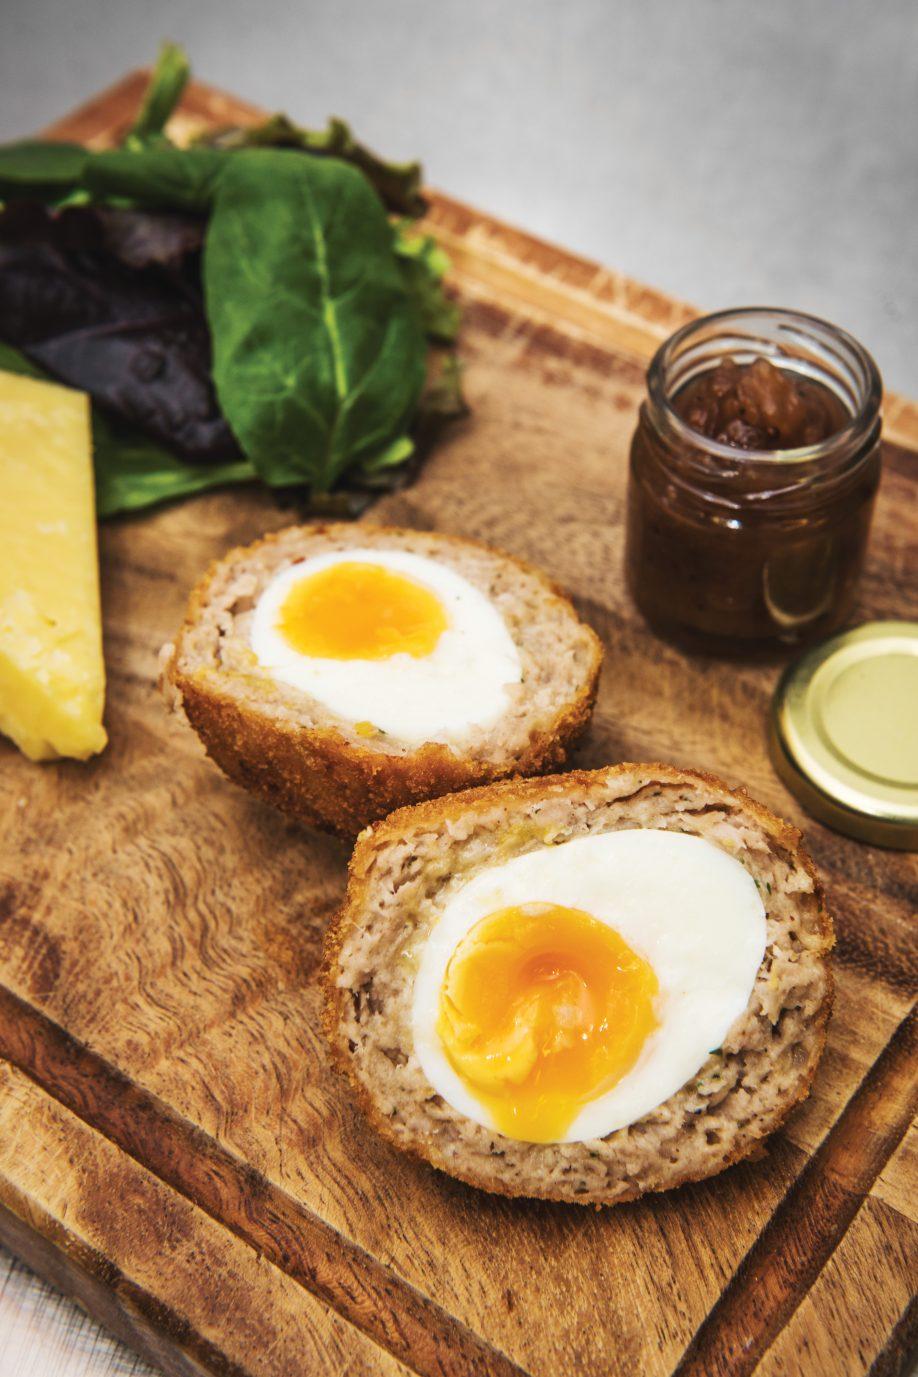 taste-fool-west-country-ploughmans-scotch-eggs